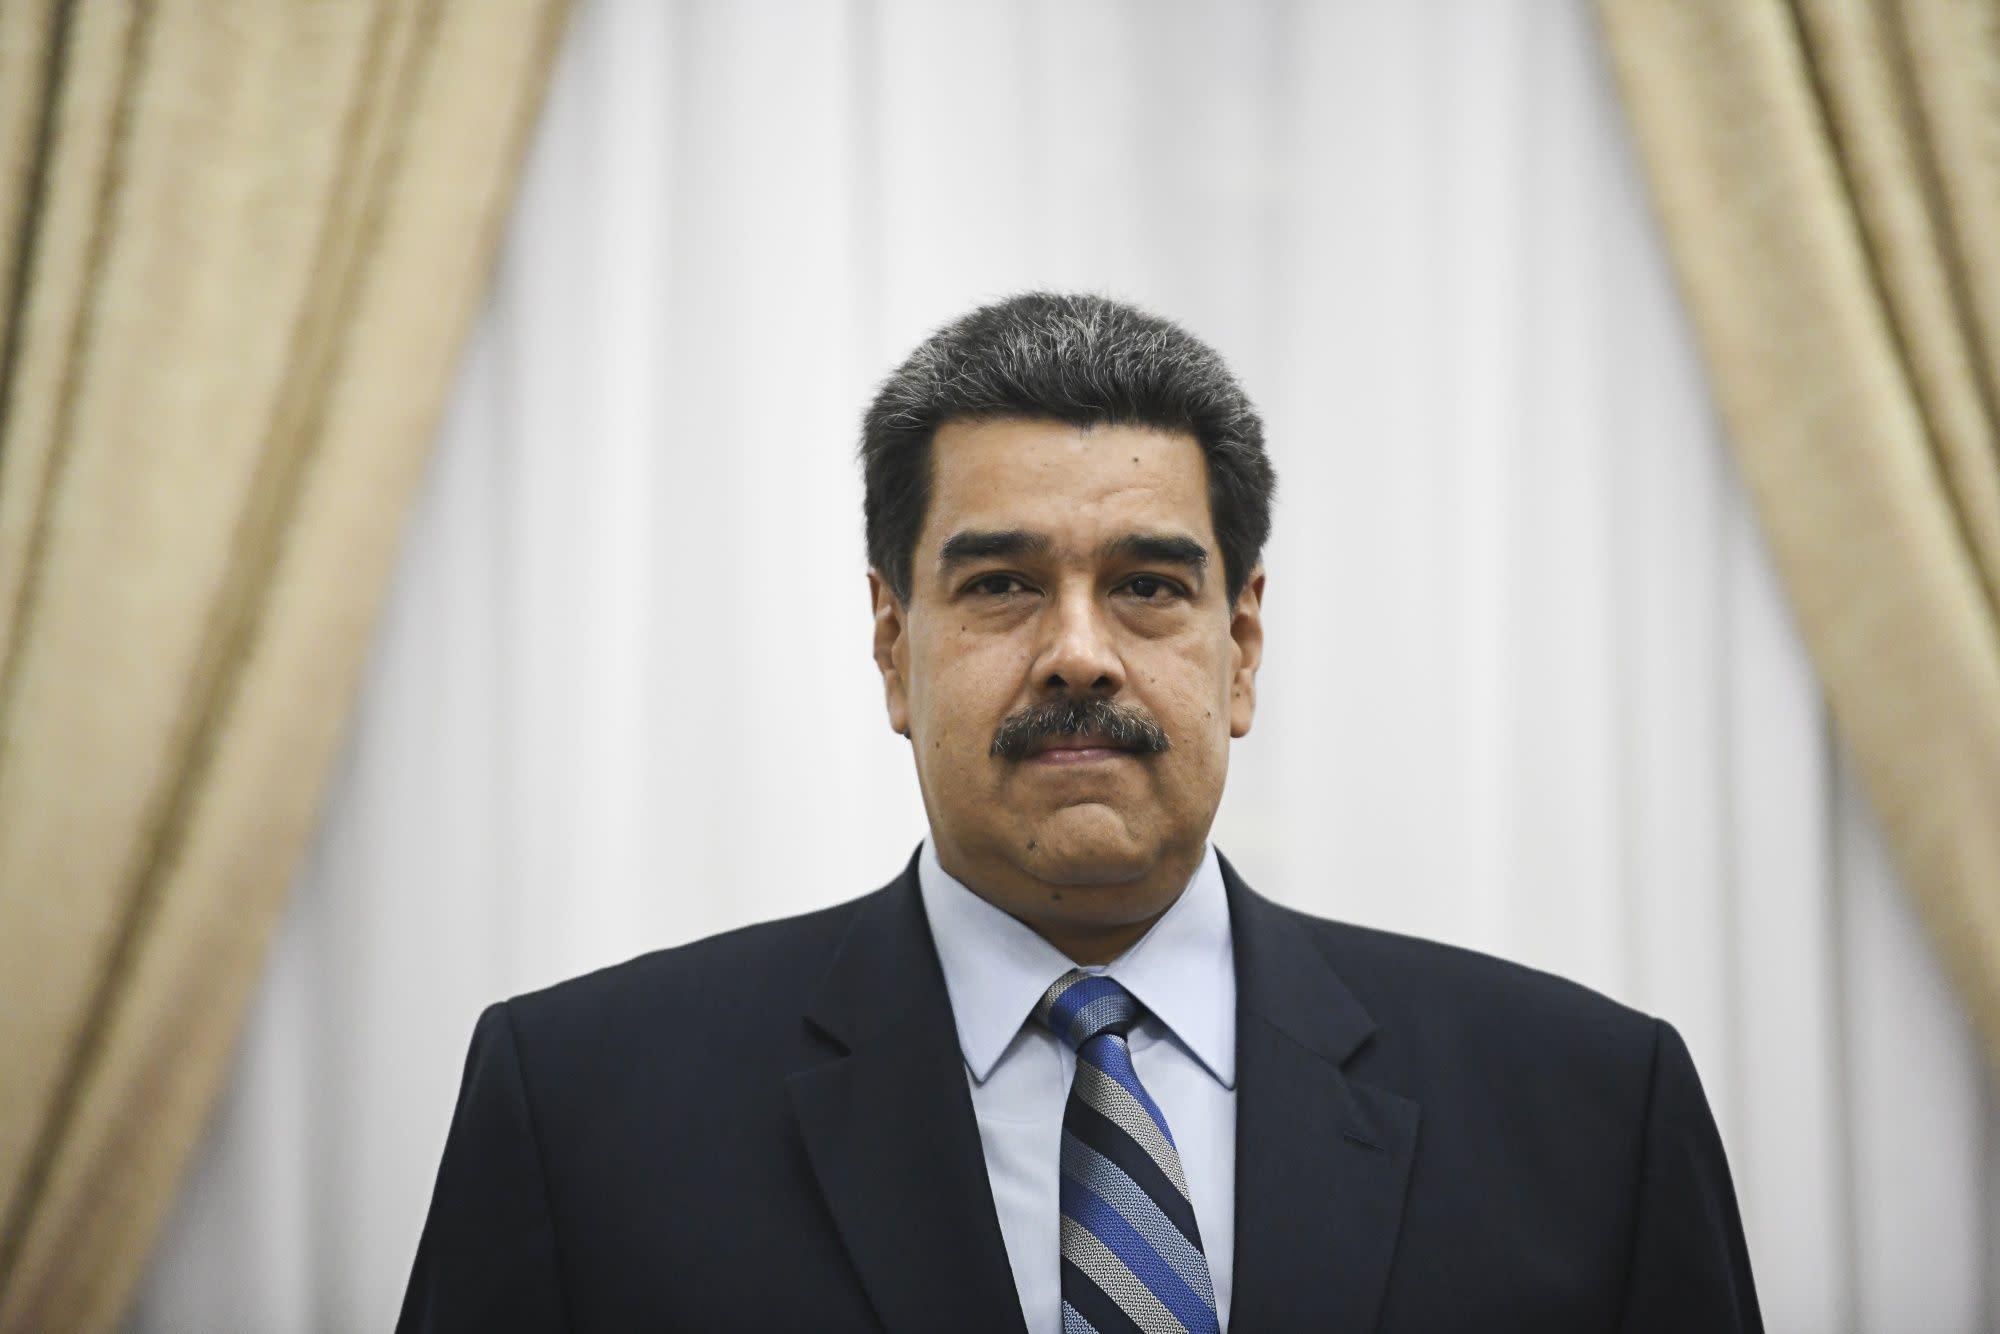 Venezuela, U.S. Have Met 'Secretly' for Months, Maduro Says